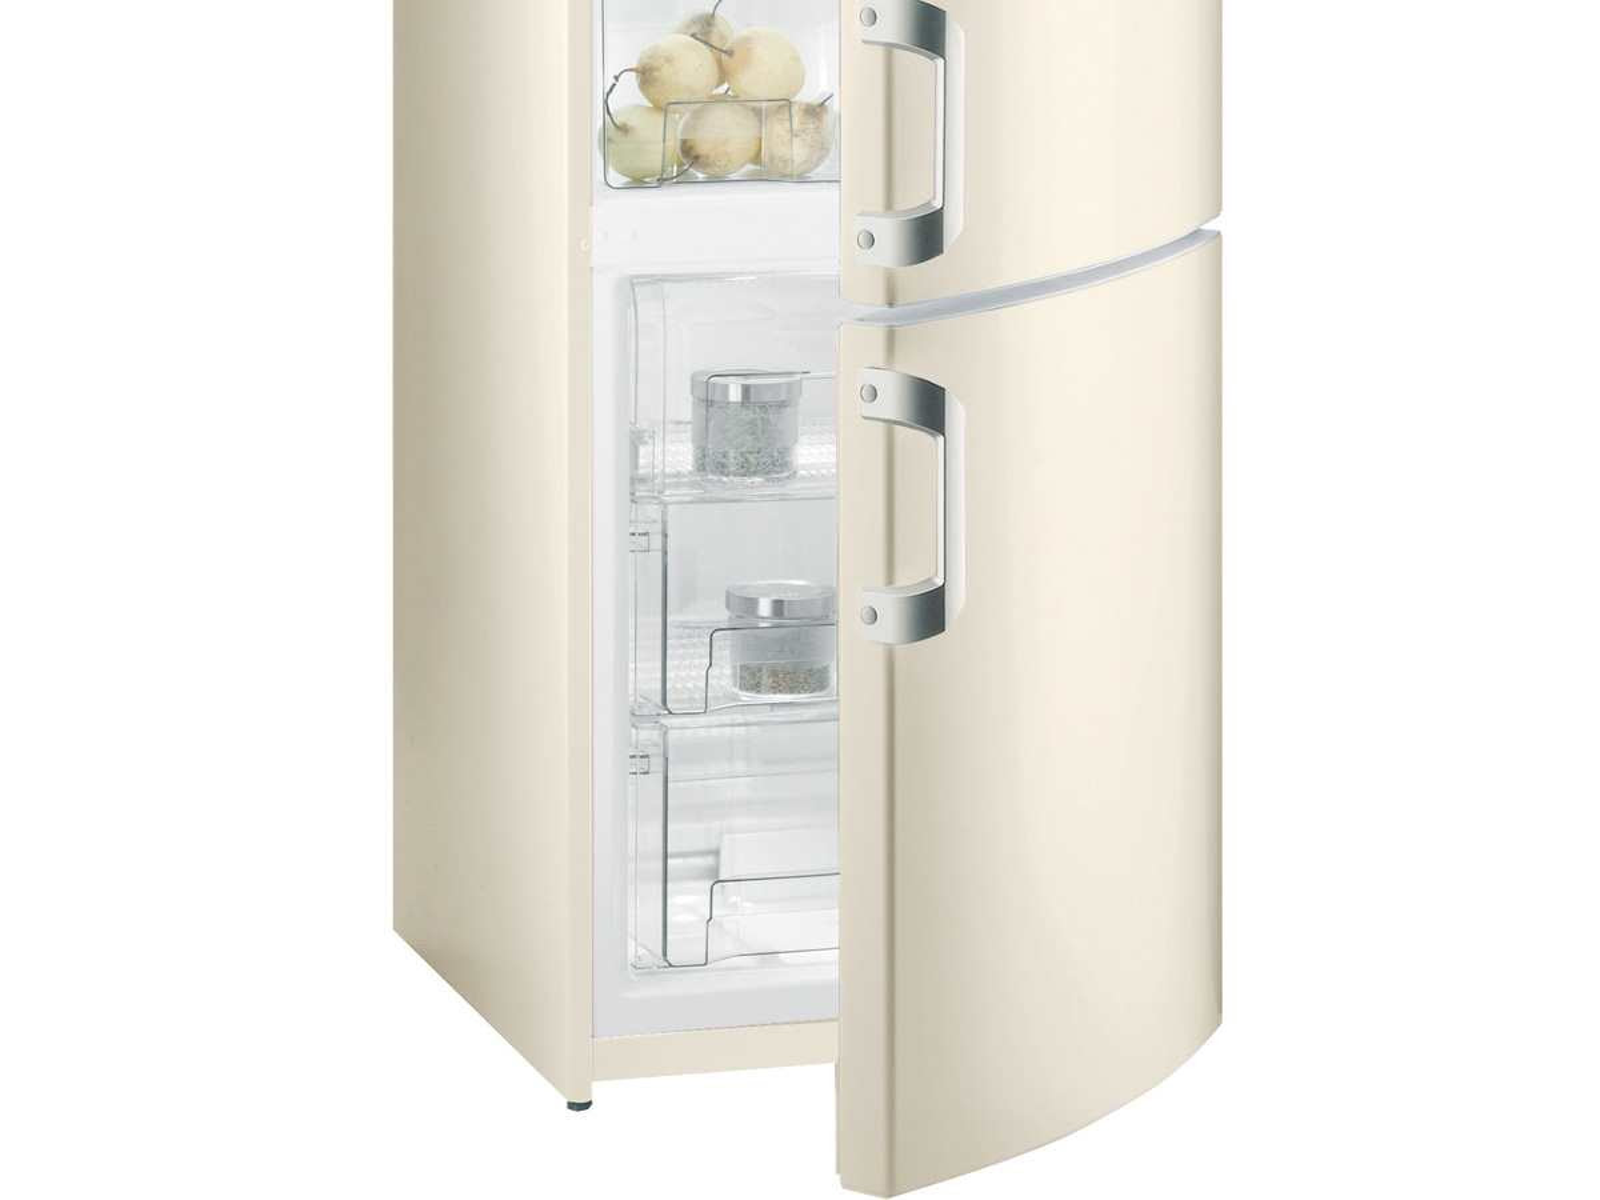 Gorenje Kühlschrank Idealo : Rk bc gorenje creme rachael haugh